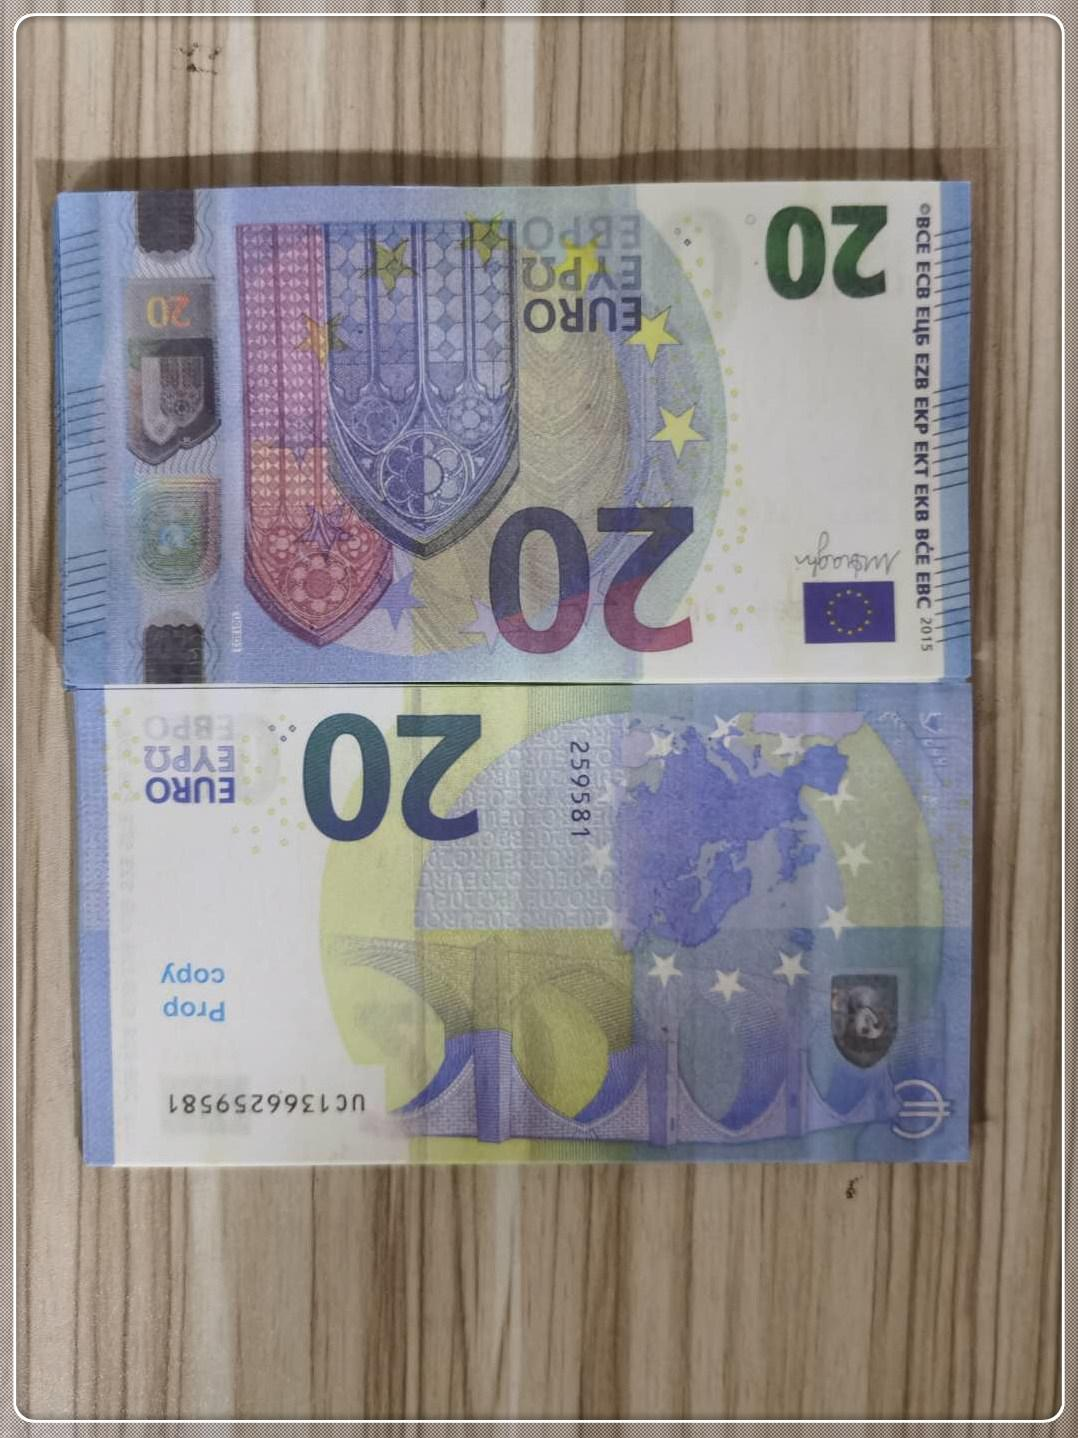 Requisite-Requisiten Faux 2021 Währungsbanknote Le20-37 Euro Heiß Realistische QFJUF Kinderticket Geschenk Spielzeug 20 Kopie Billet Bar Poqfc